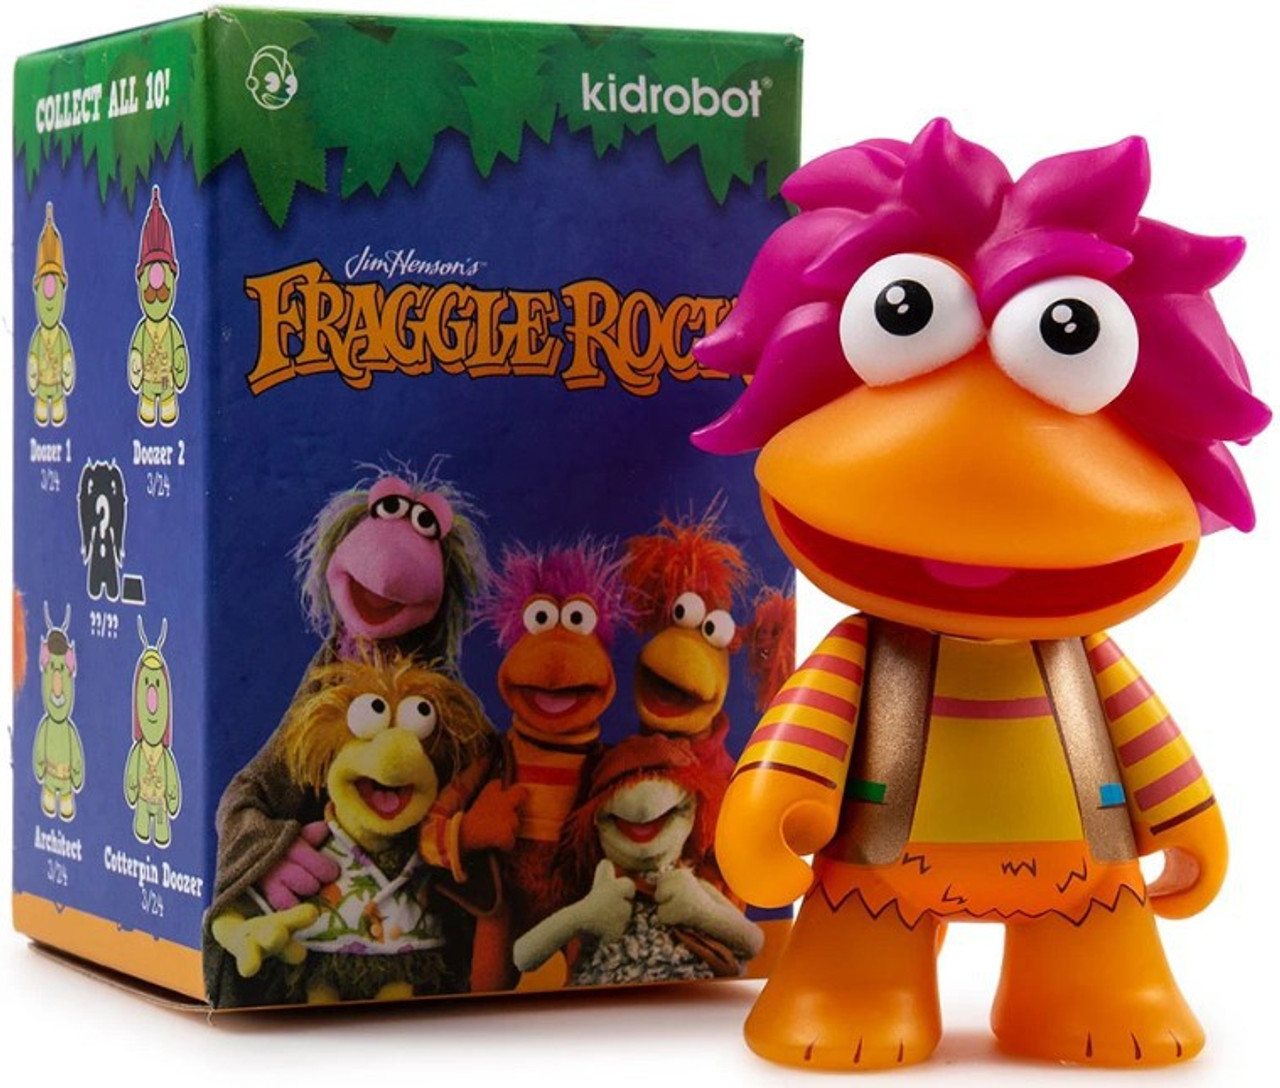 Kidrobot FRAGGLE ROCK Mini Series DOOZER 1 Vinyl Figure Opened Blind Box